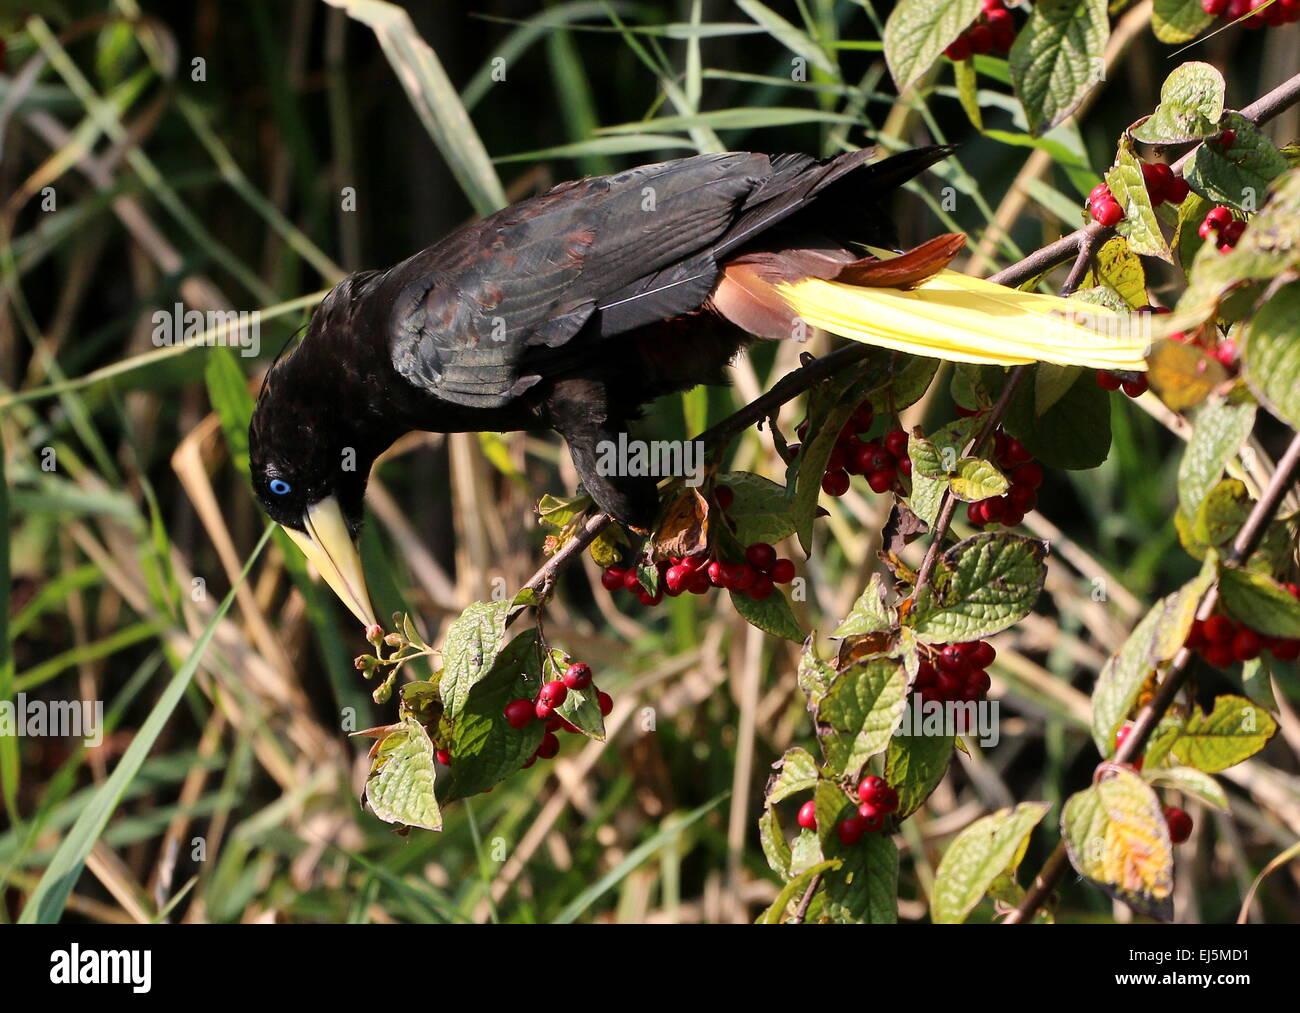 South American Crested Oropendola (Psarocolius decumanus) eating berries in a tree - Stock Image